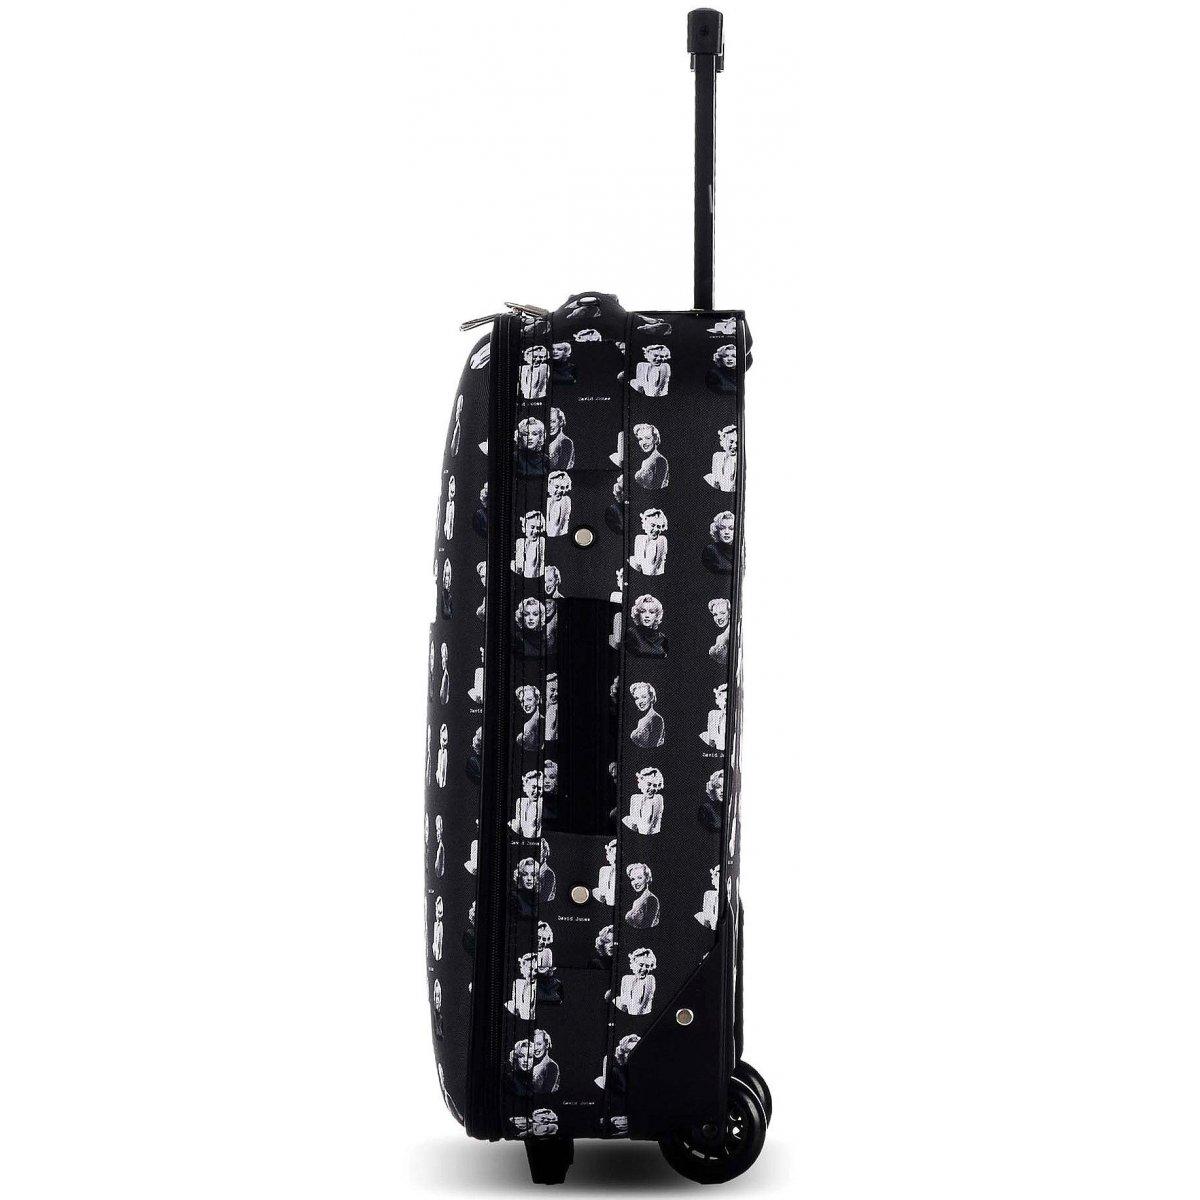 valise cabine ryanair et reporter david jones ba10032 couleur principale marilyn monroe. Black Bedroom Furniture Sets. Home Design Ideas